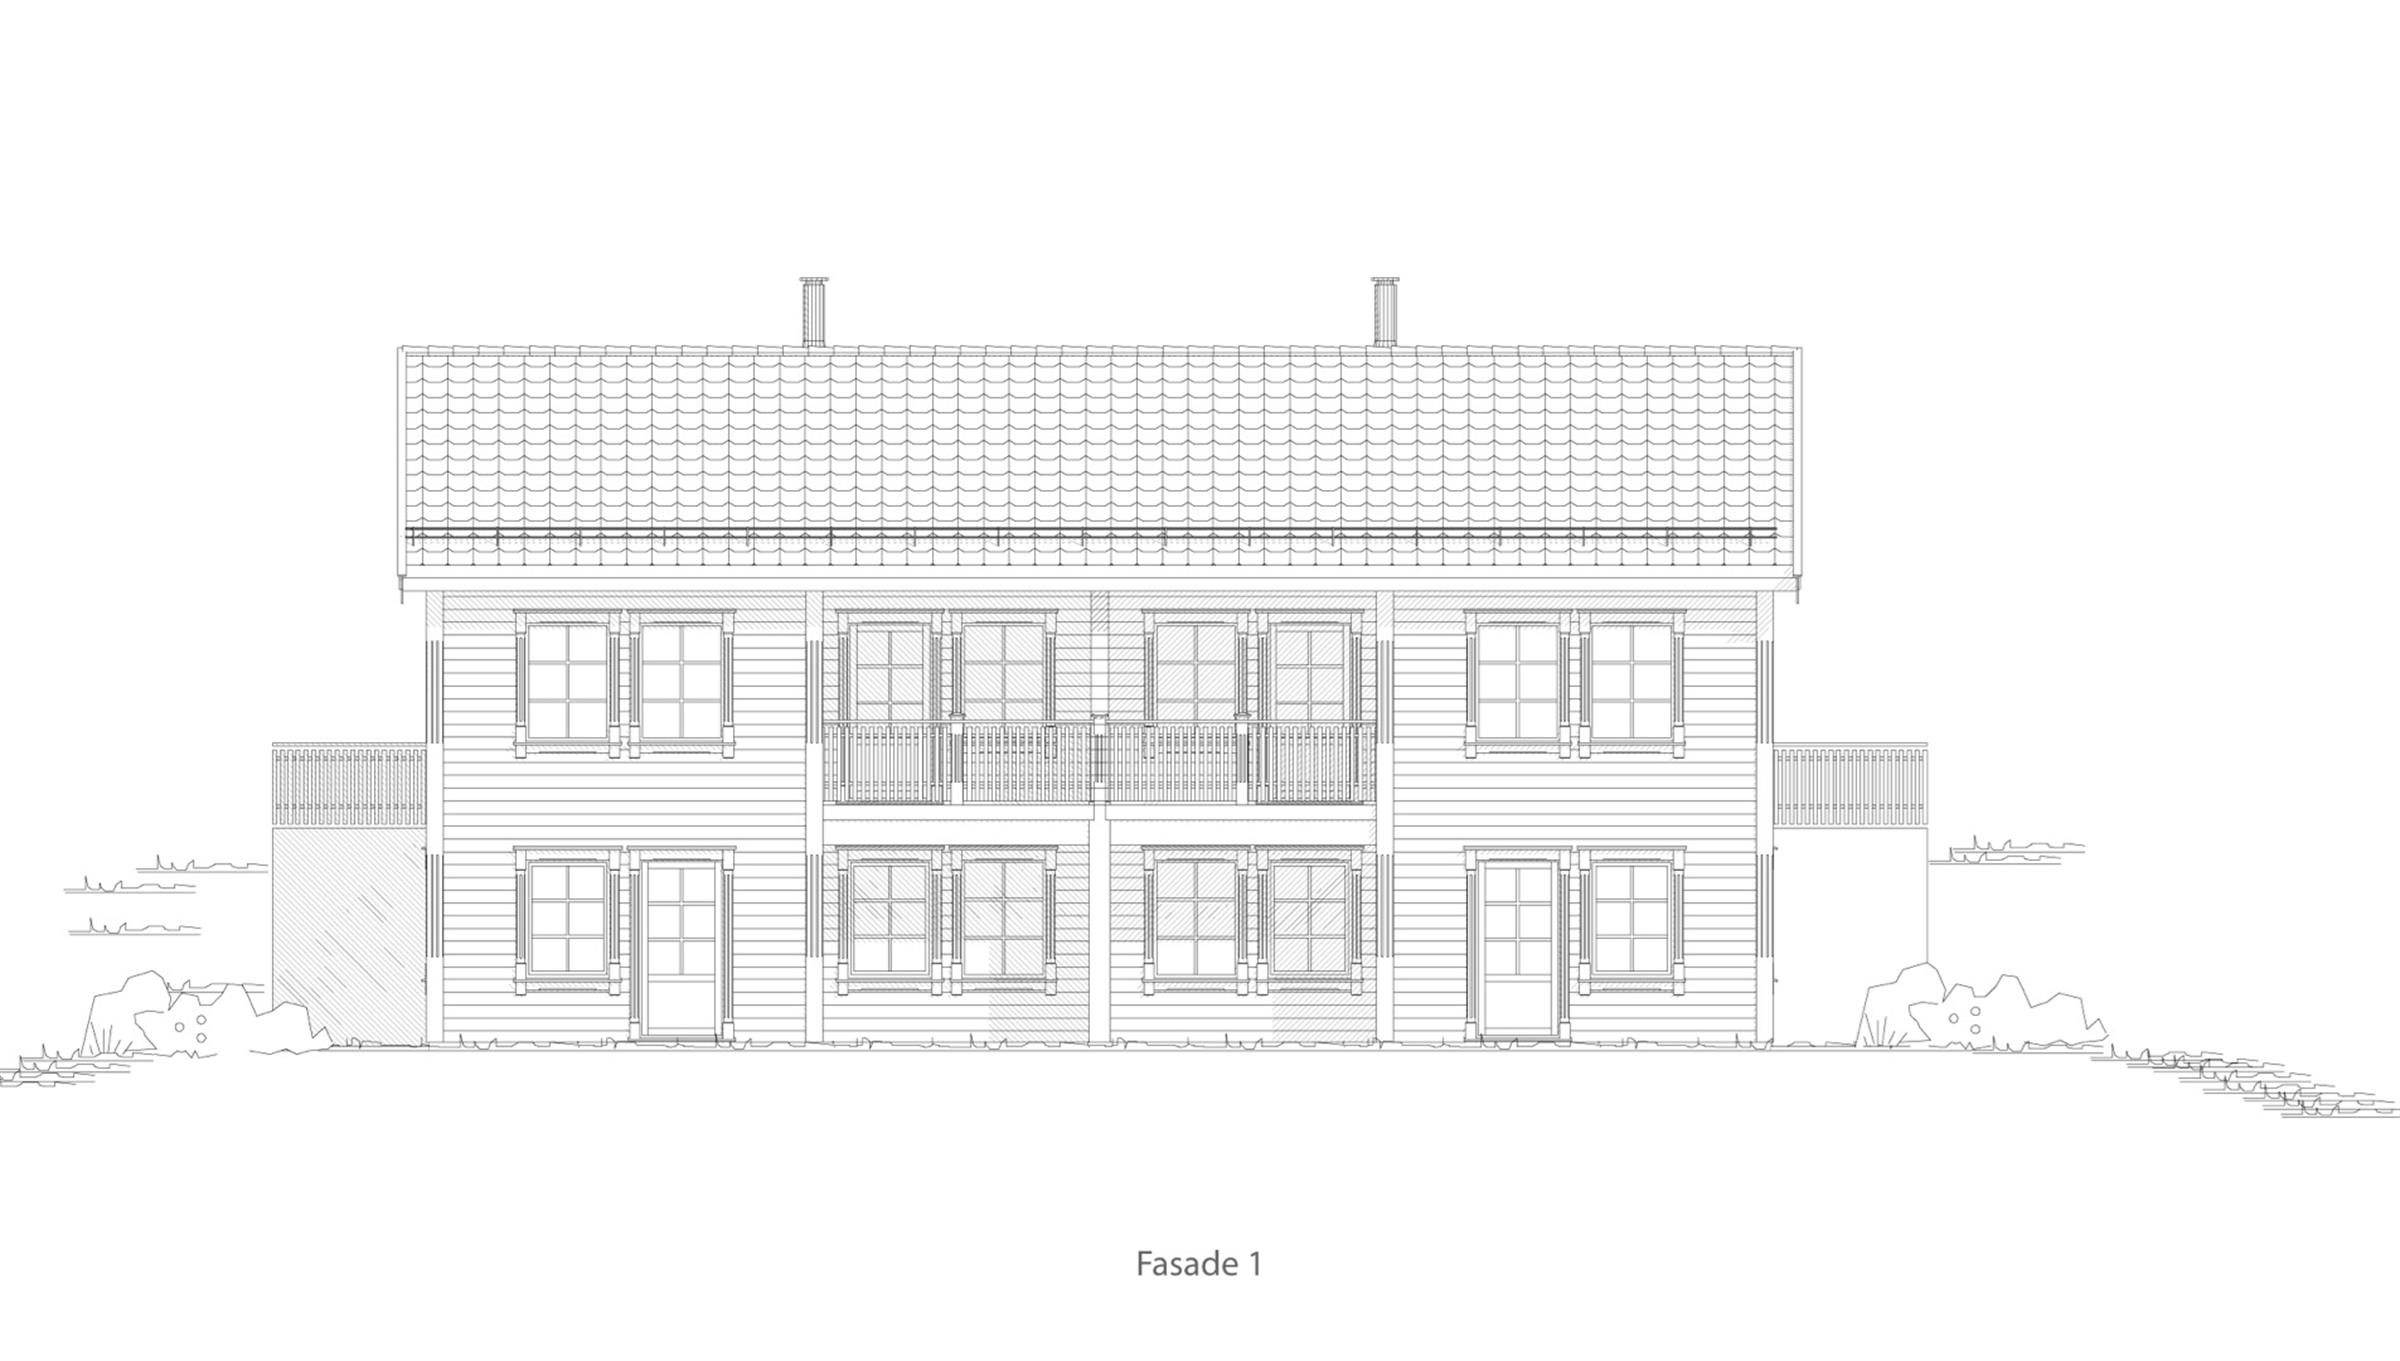 Sortland fasade 1